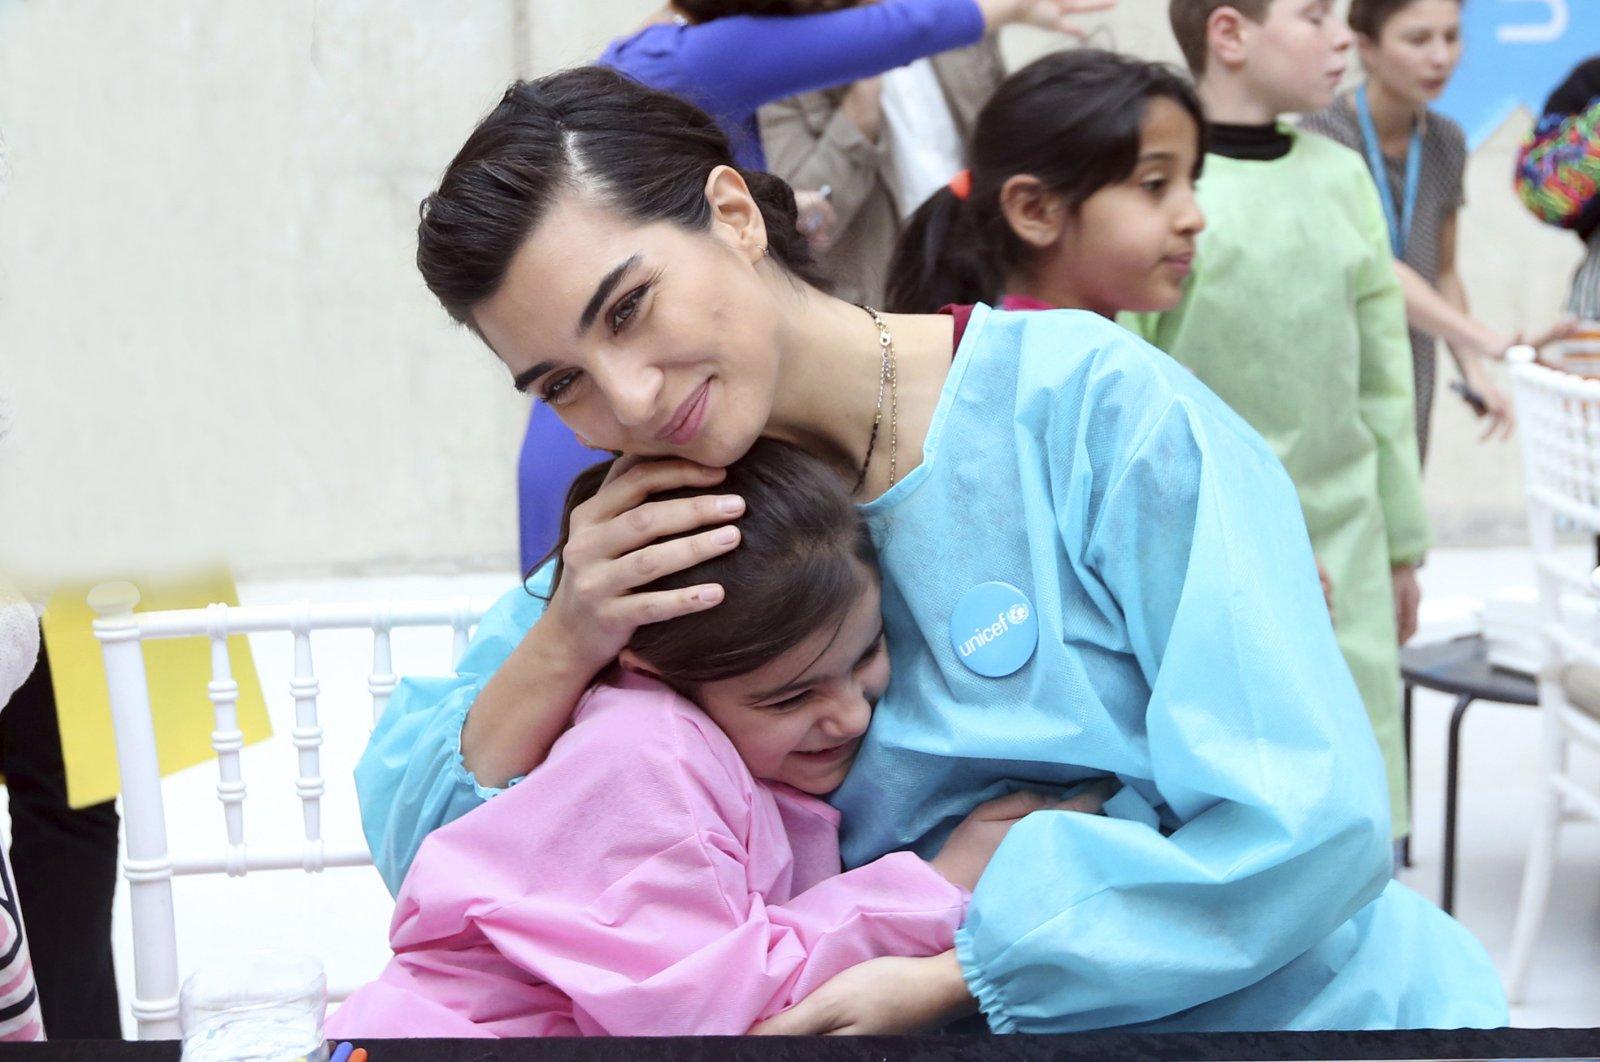 Famous Turkish actress Tuba Büyüküstün, who is also a UNICEF goodwill ambassador, in an organization for refugee children, in Turkey, 2018. (AA Photo)